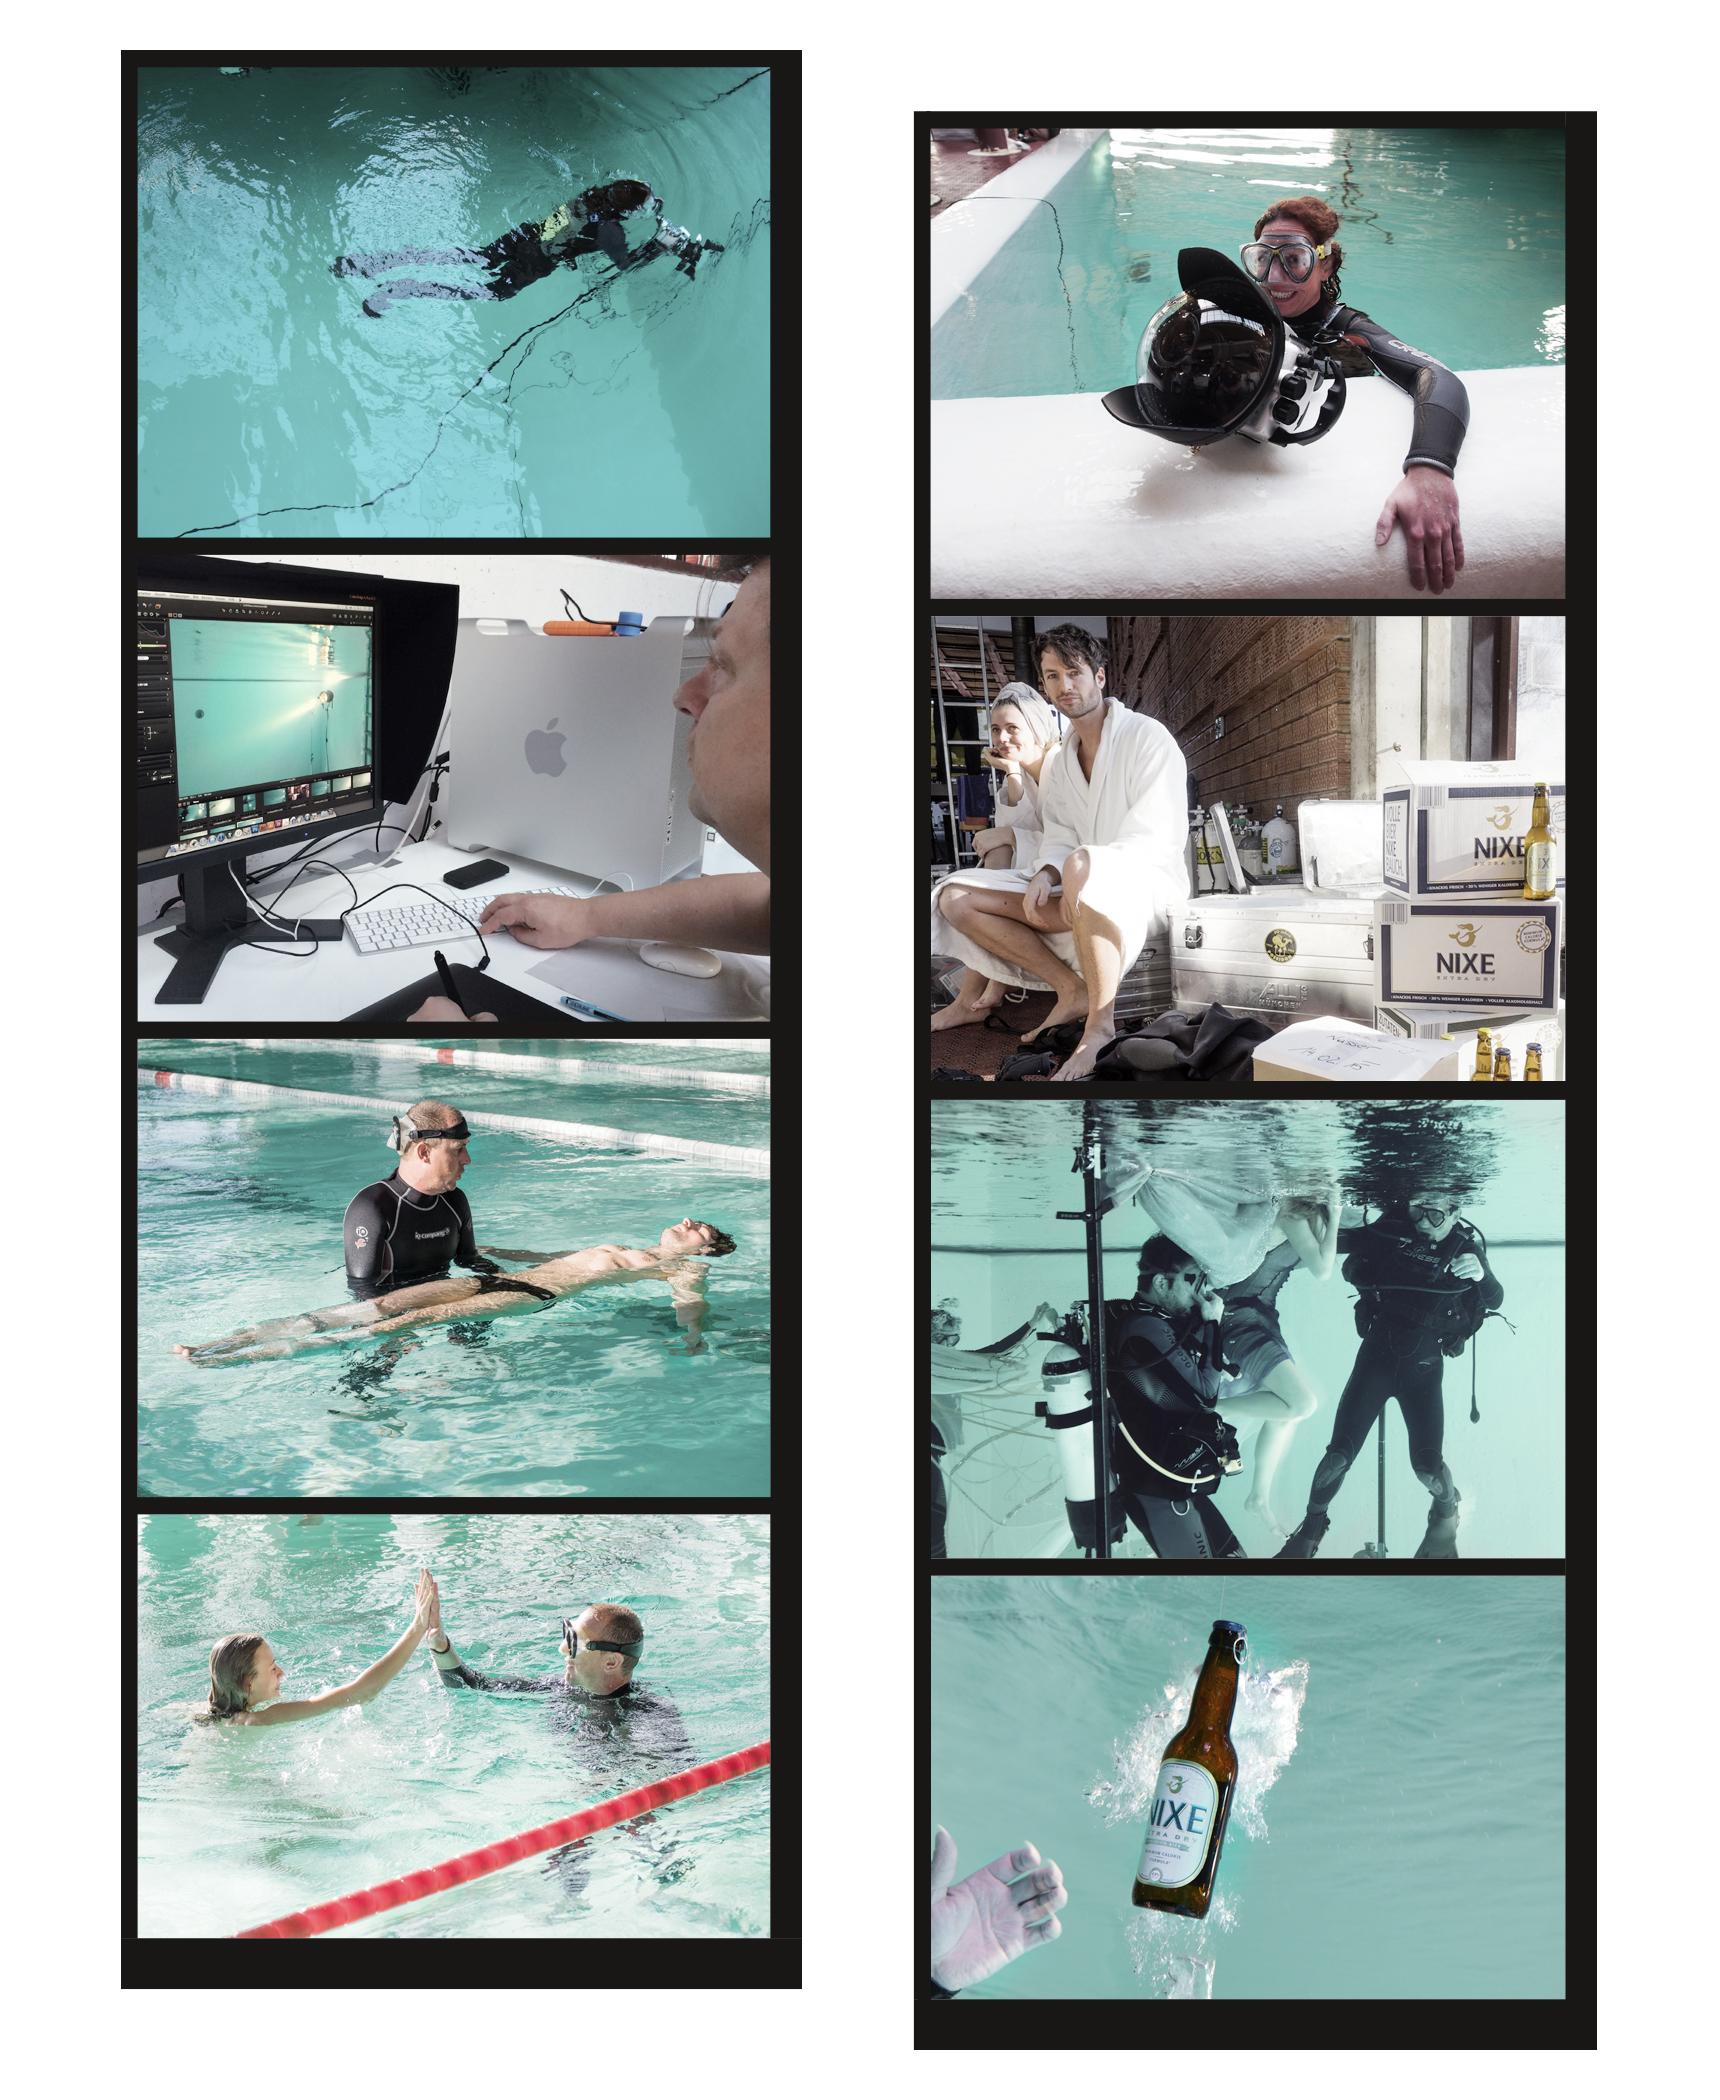 NIXE underwater making of